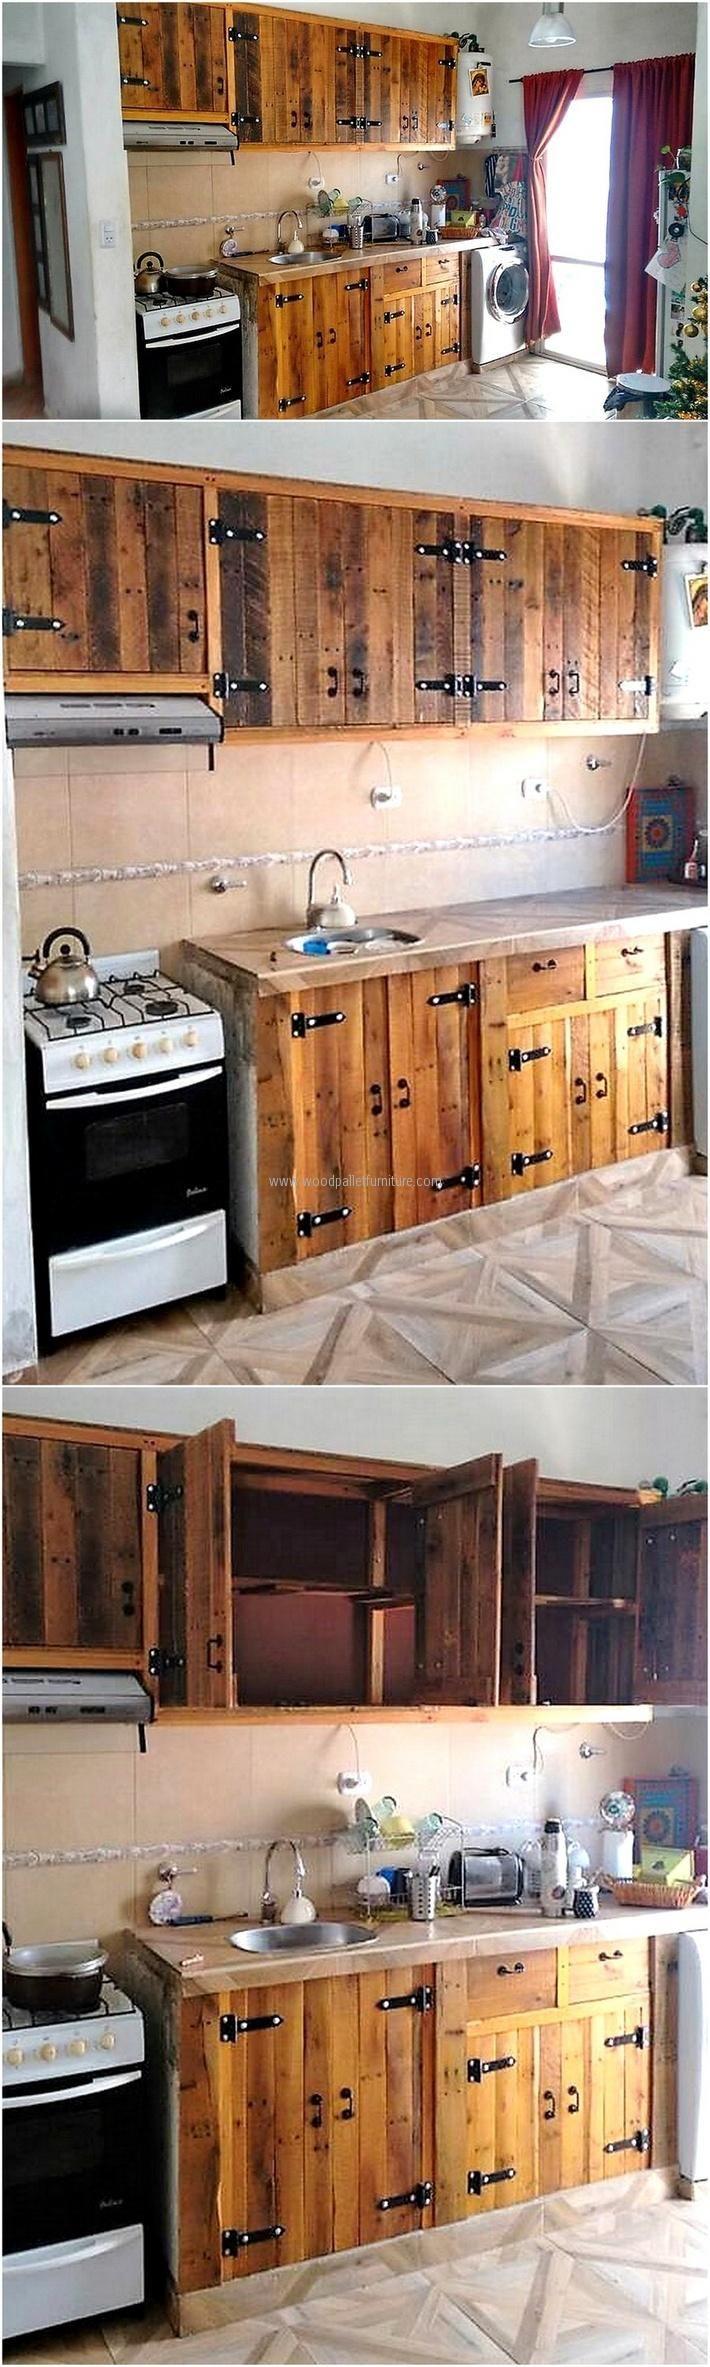 pallet-made-cucina-armadi